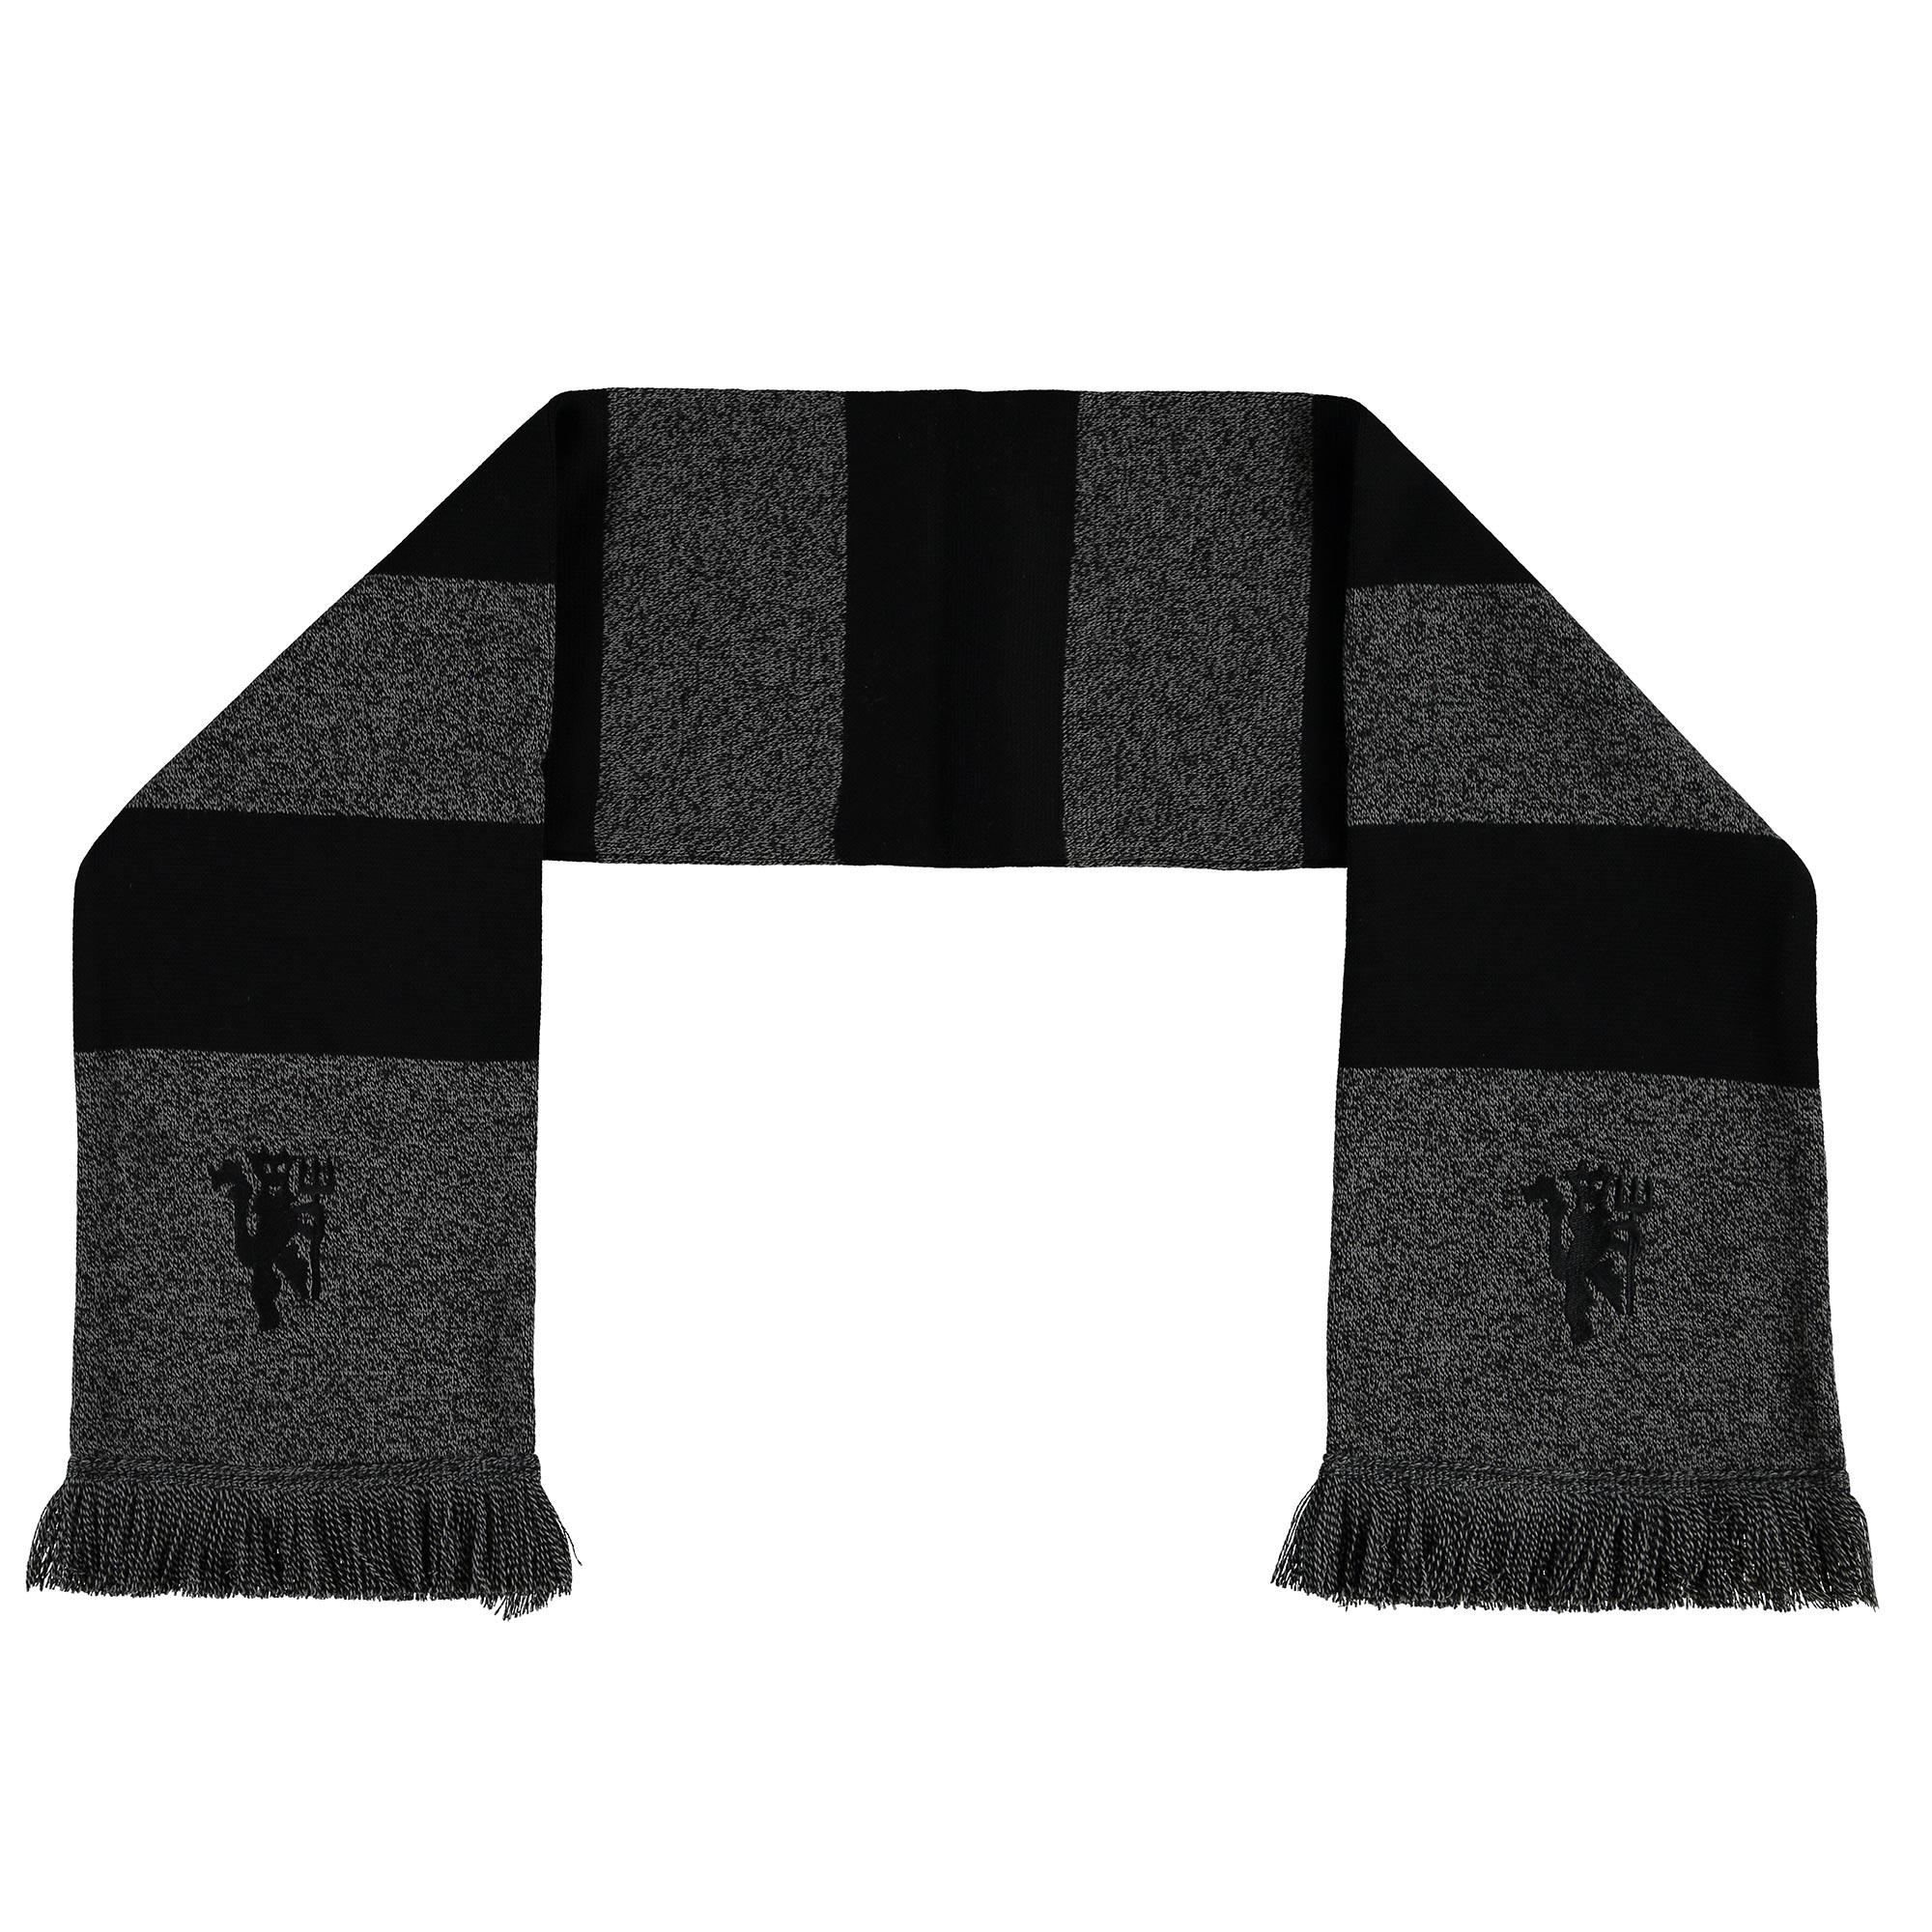 Manchester United Marl Striped Scarf - Grey/Black - Adult